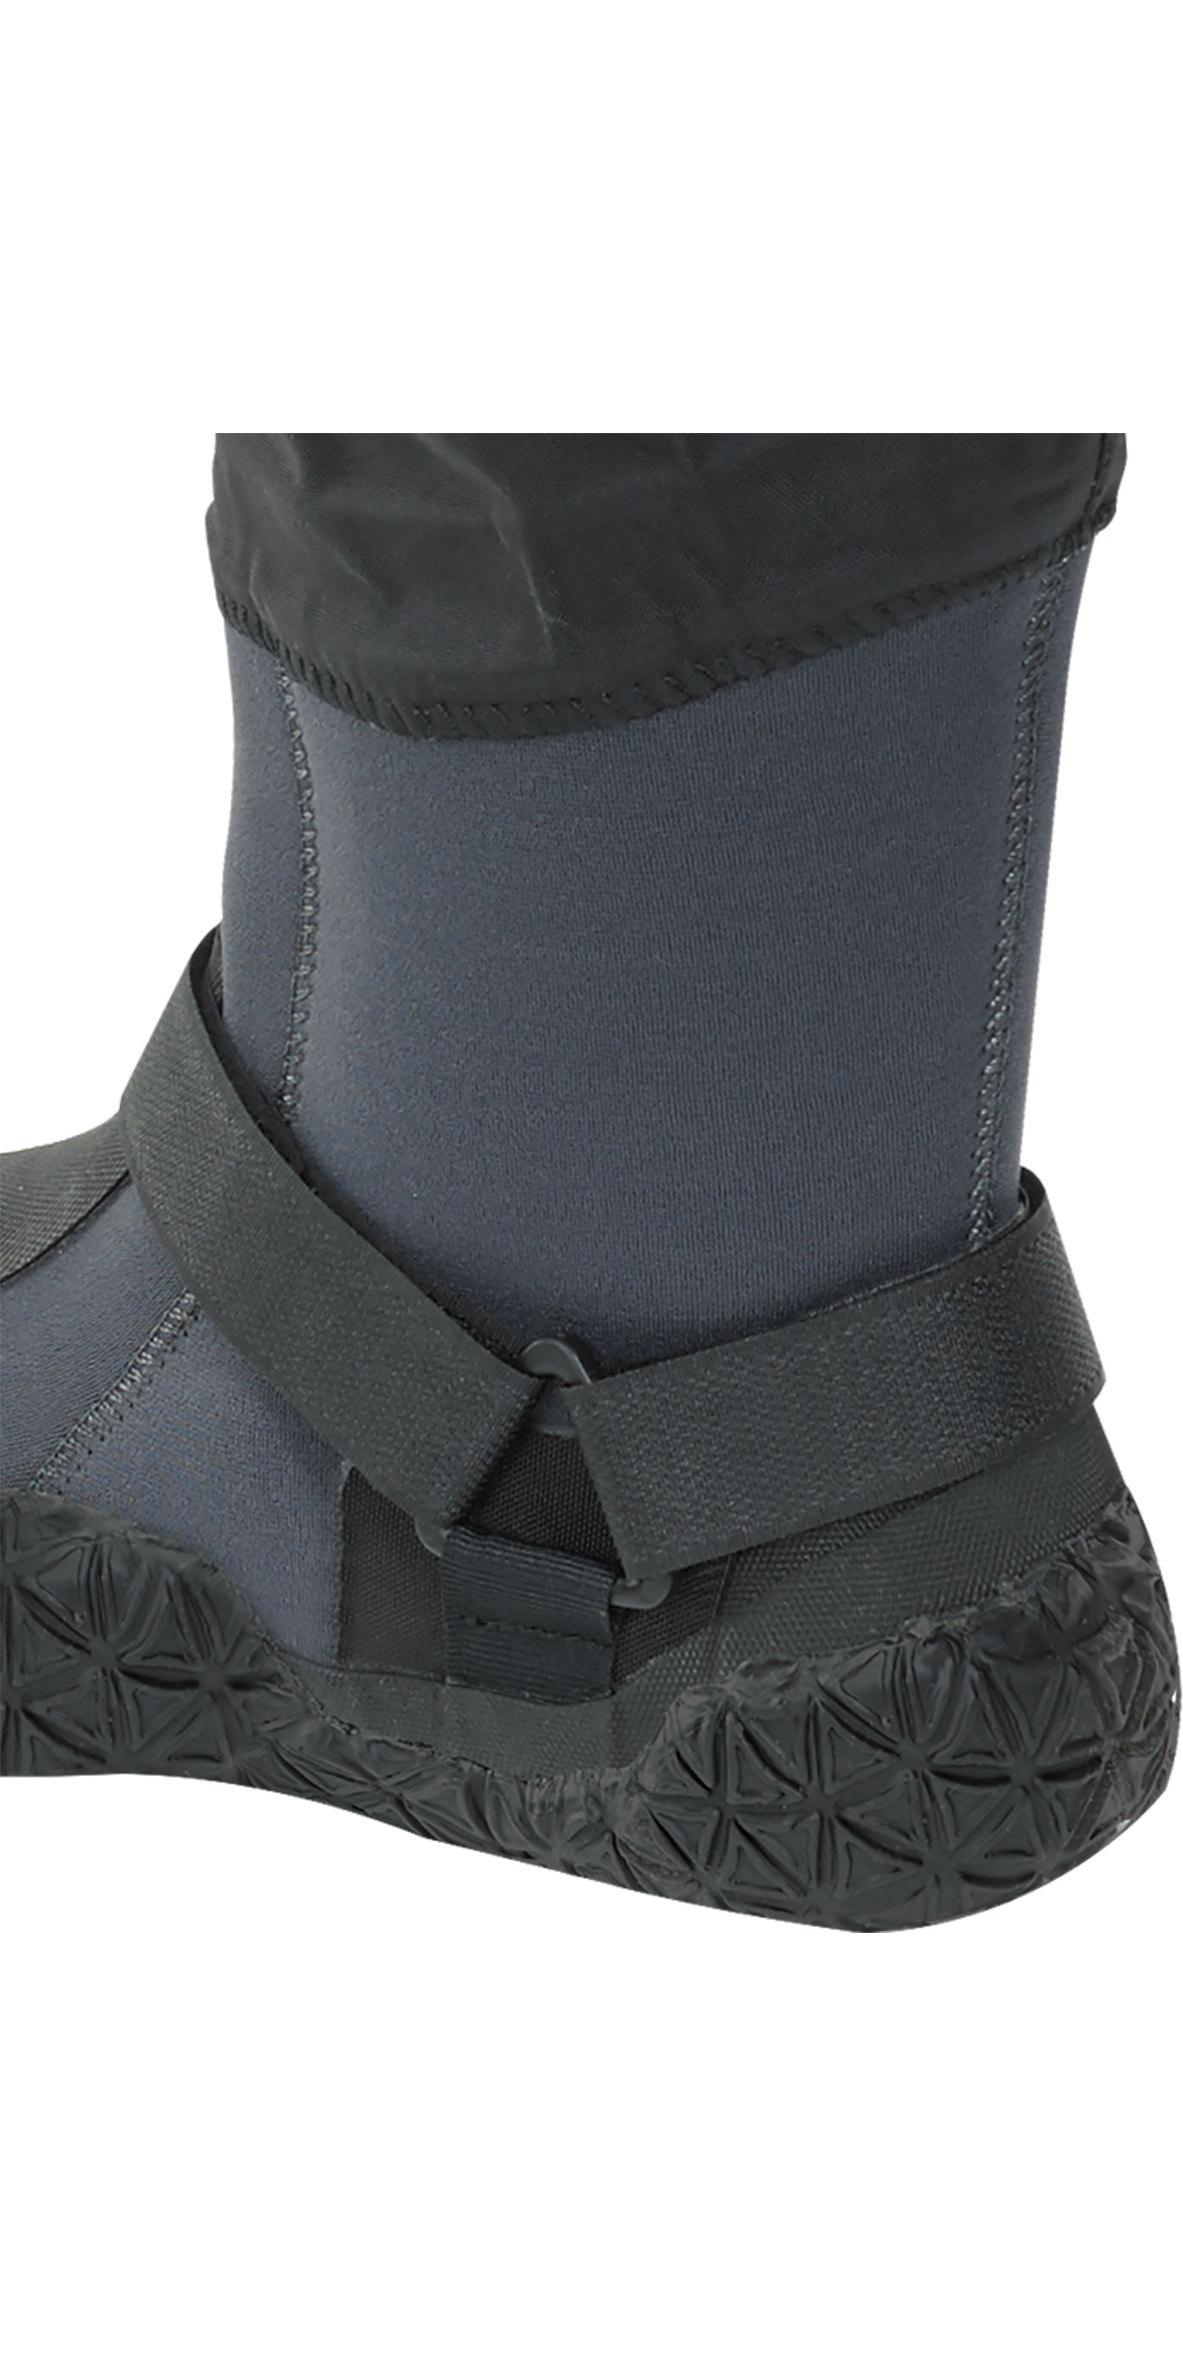 Thermisch warme W/ärmeschichtschichten Quick Dry Unisex Palm Kayak oder Kayaking Klaue 3mm Neopren-Neoprenhandschuhe Jet Grey